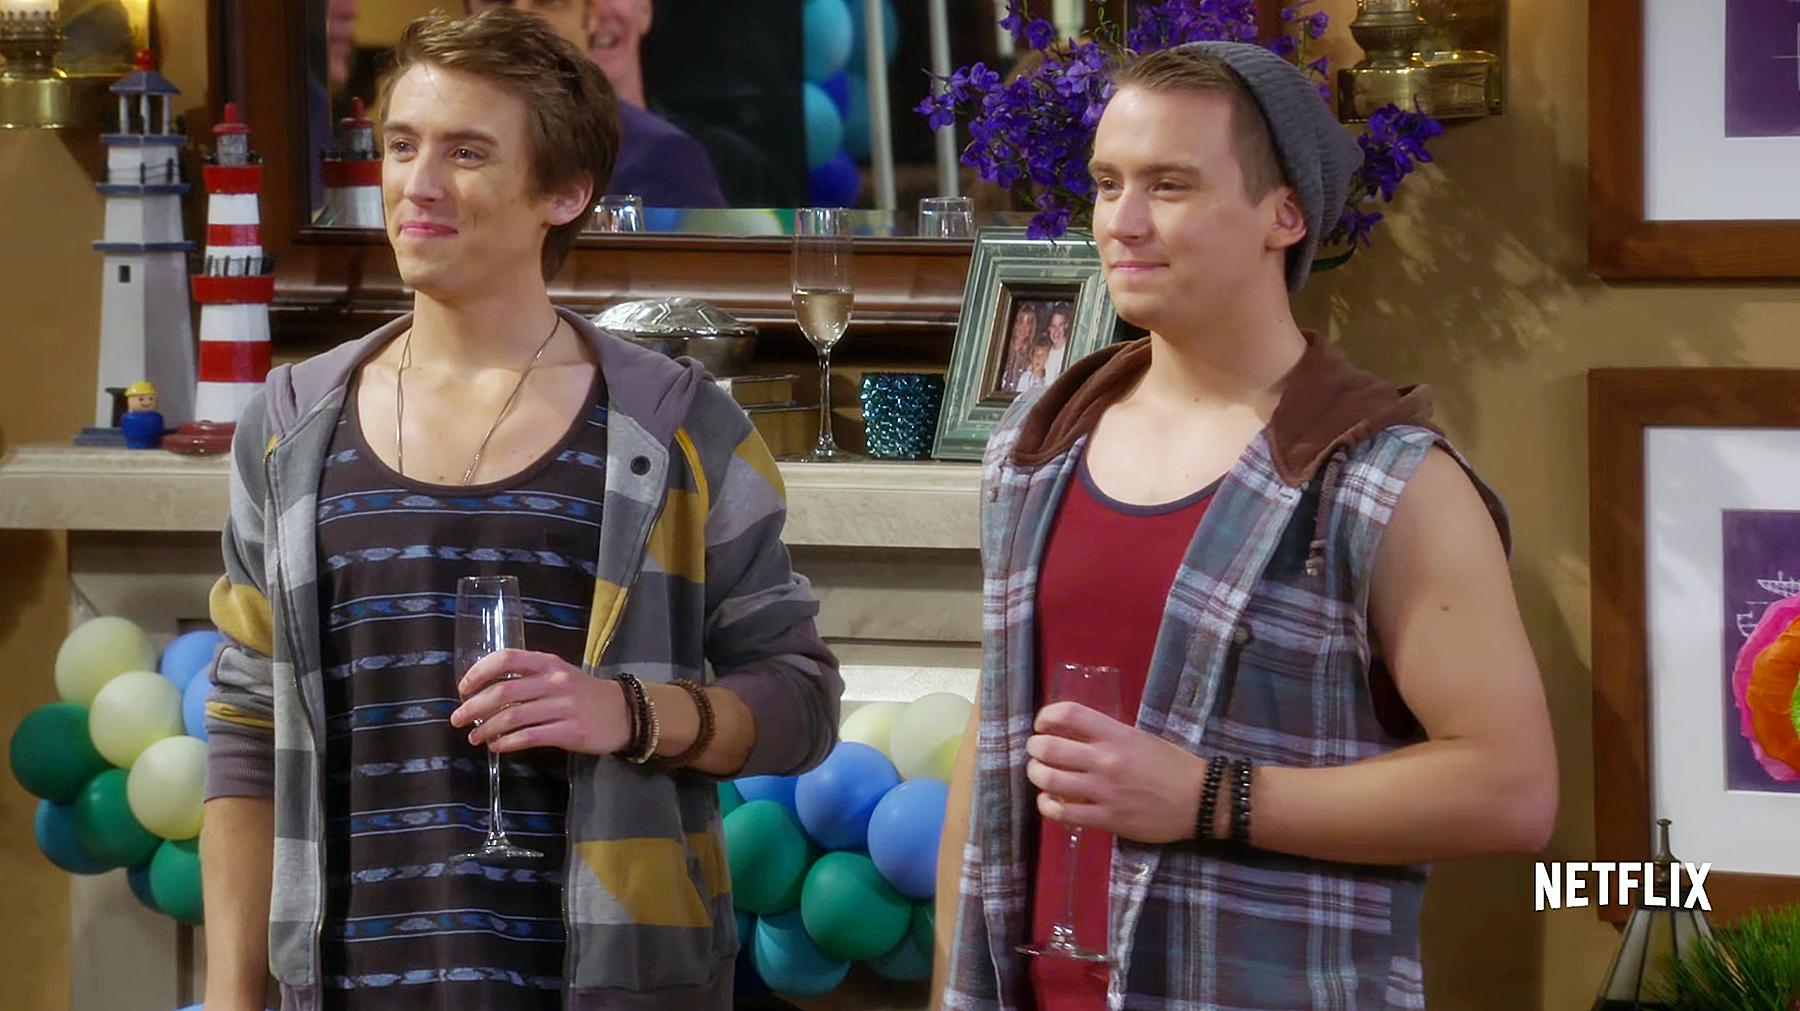 Twins Nicky and Alex